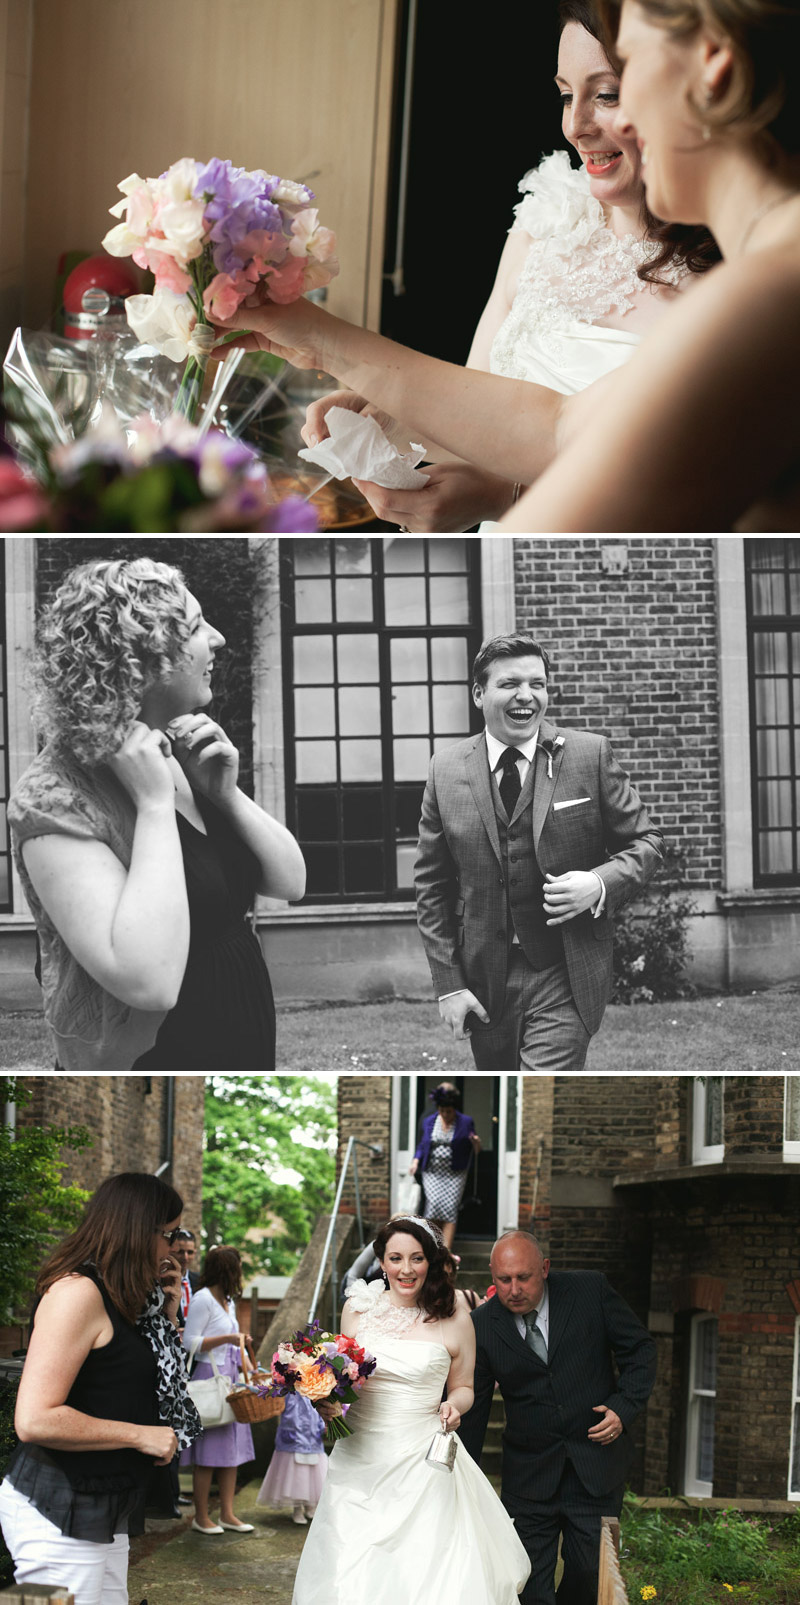 Vivien Holloway 50s Bridesmaid Dresses